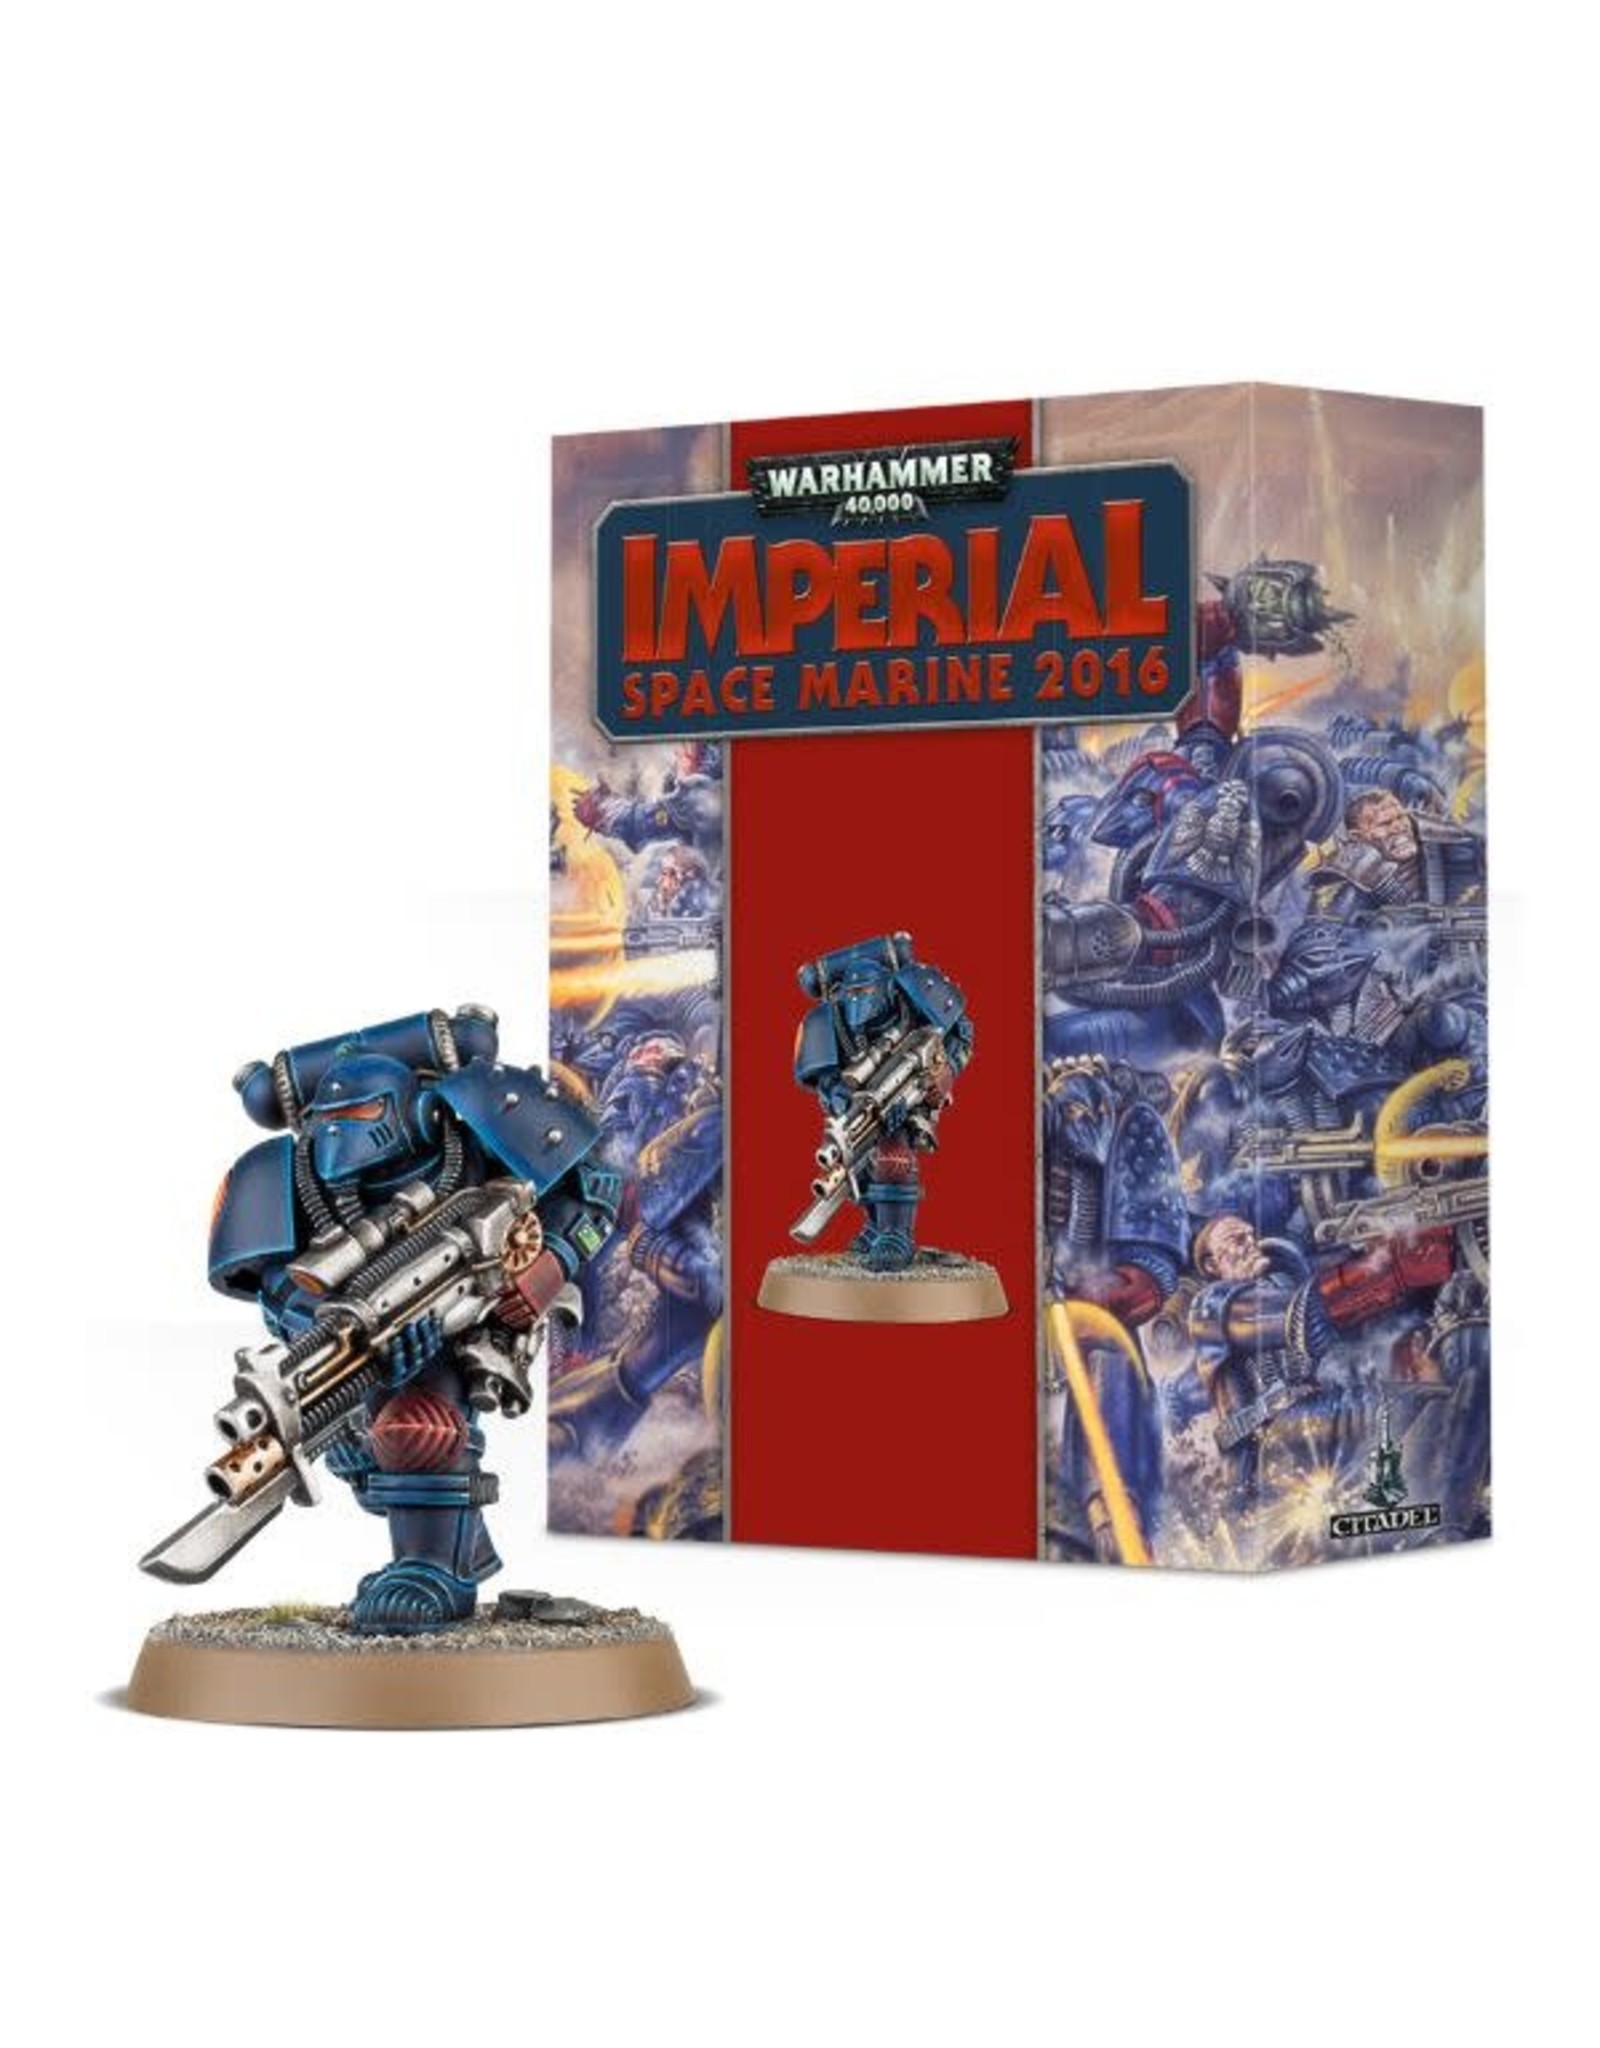 Games-Workshop Warhammer40k Imperial space marine 2016